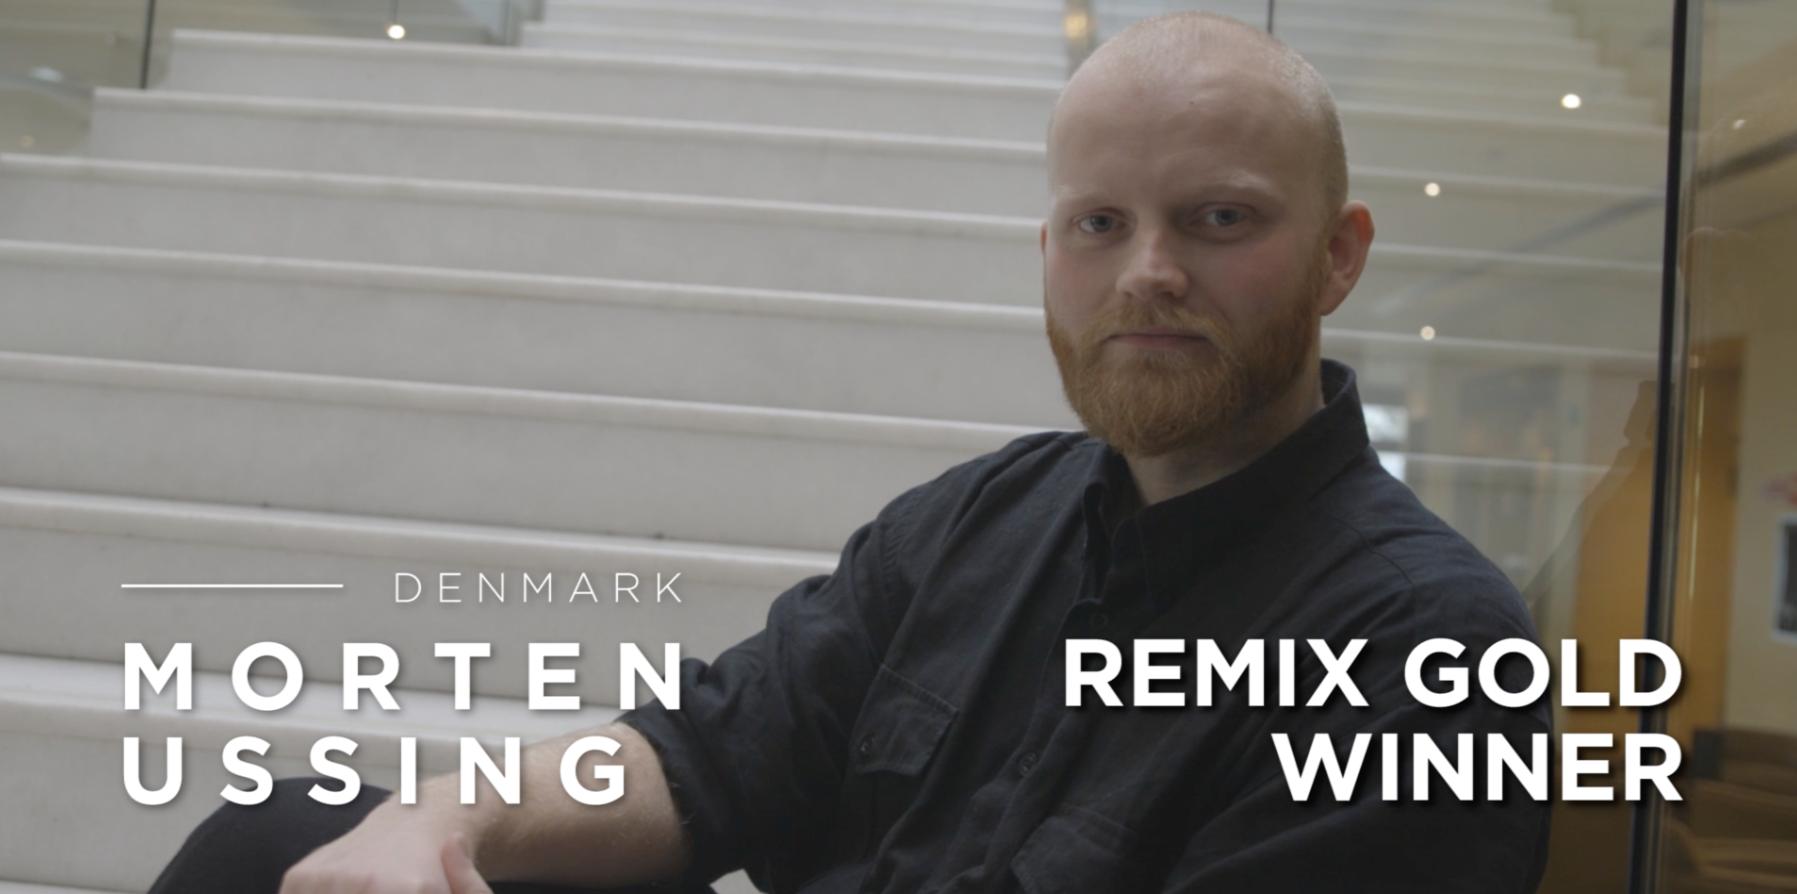 Morten Ussing Remix 2017 Winner